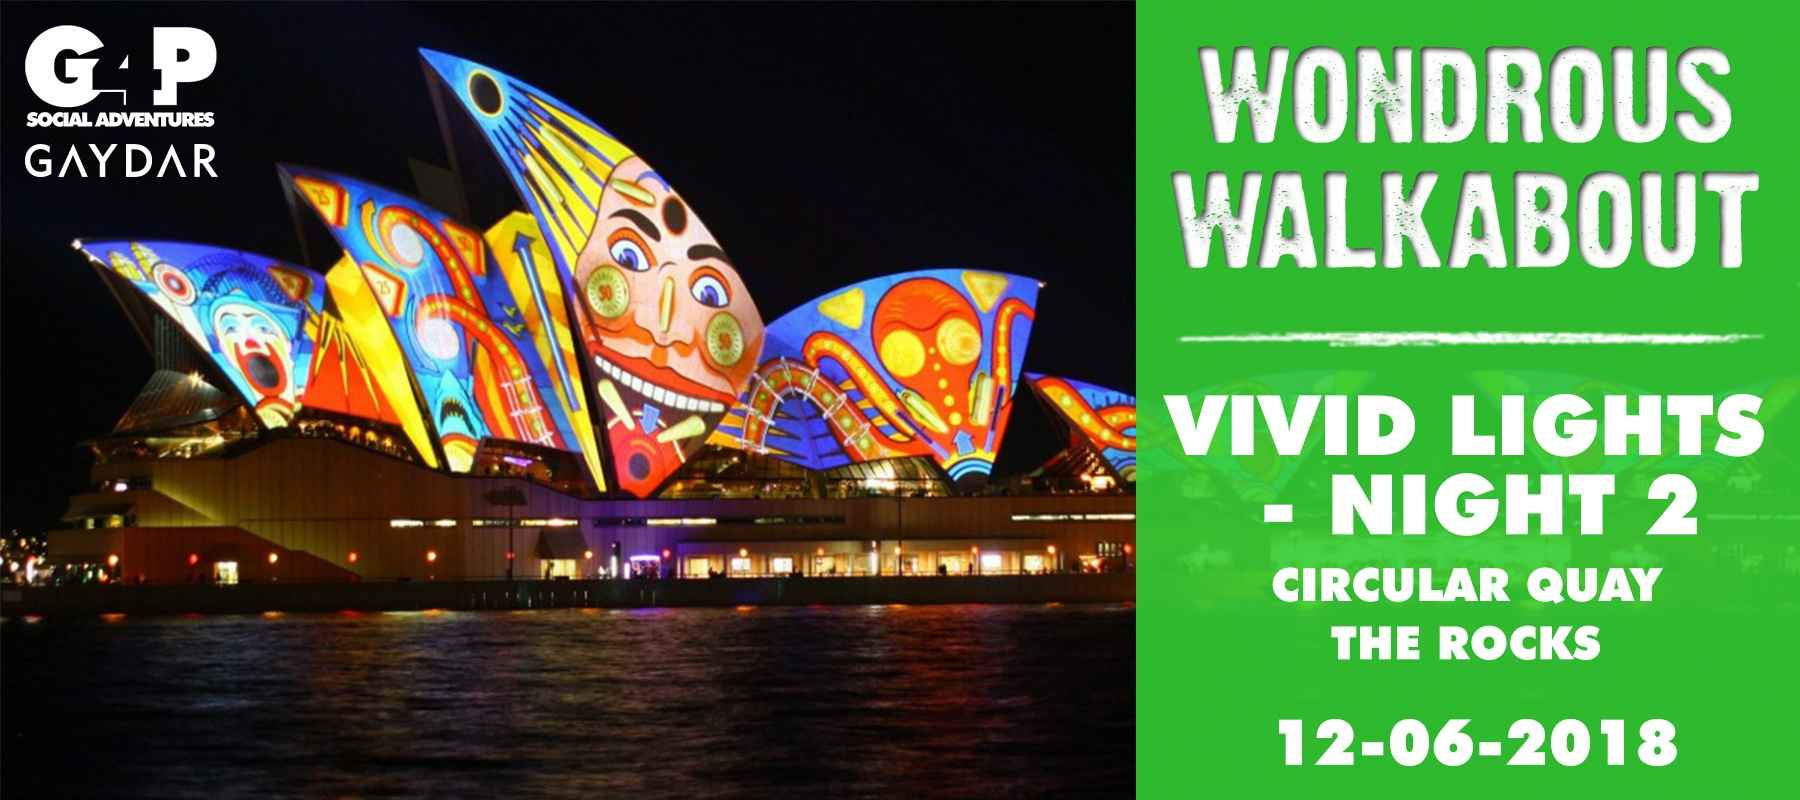 Wondrous Walkabout – Vivid Lights – Night 2